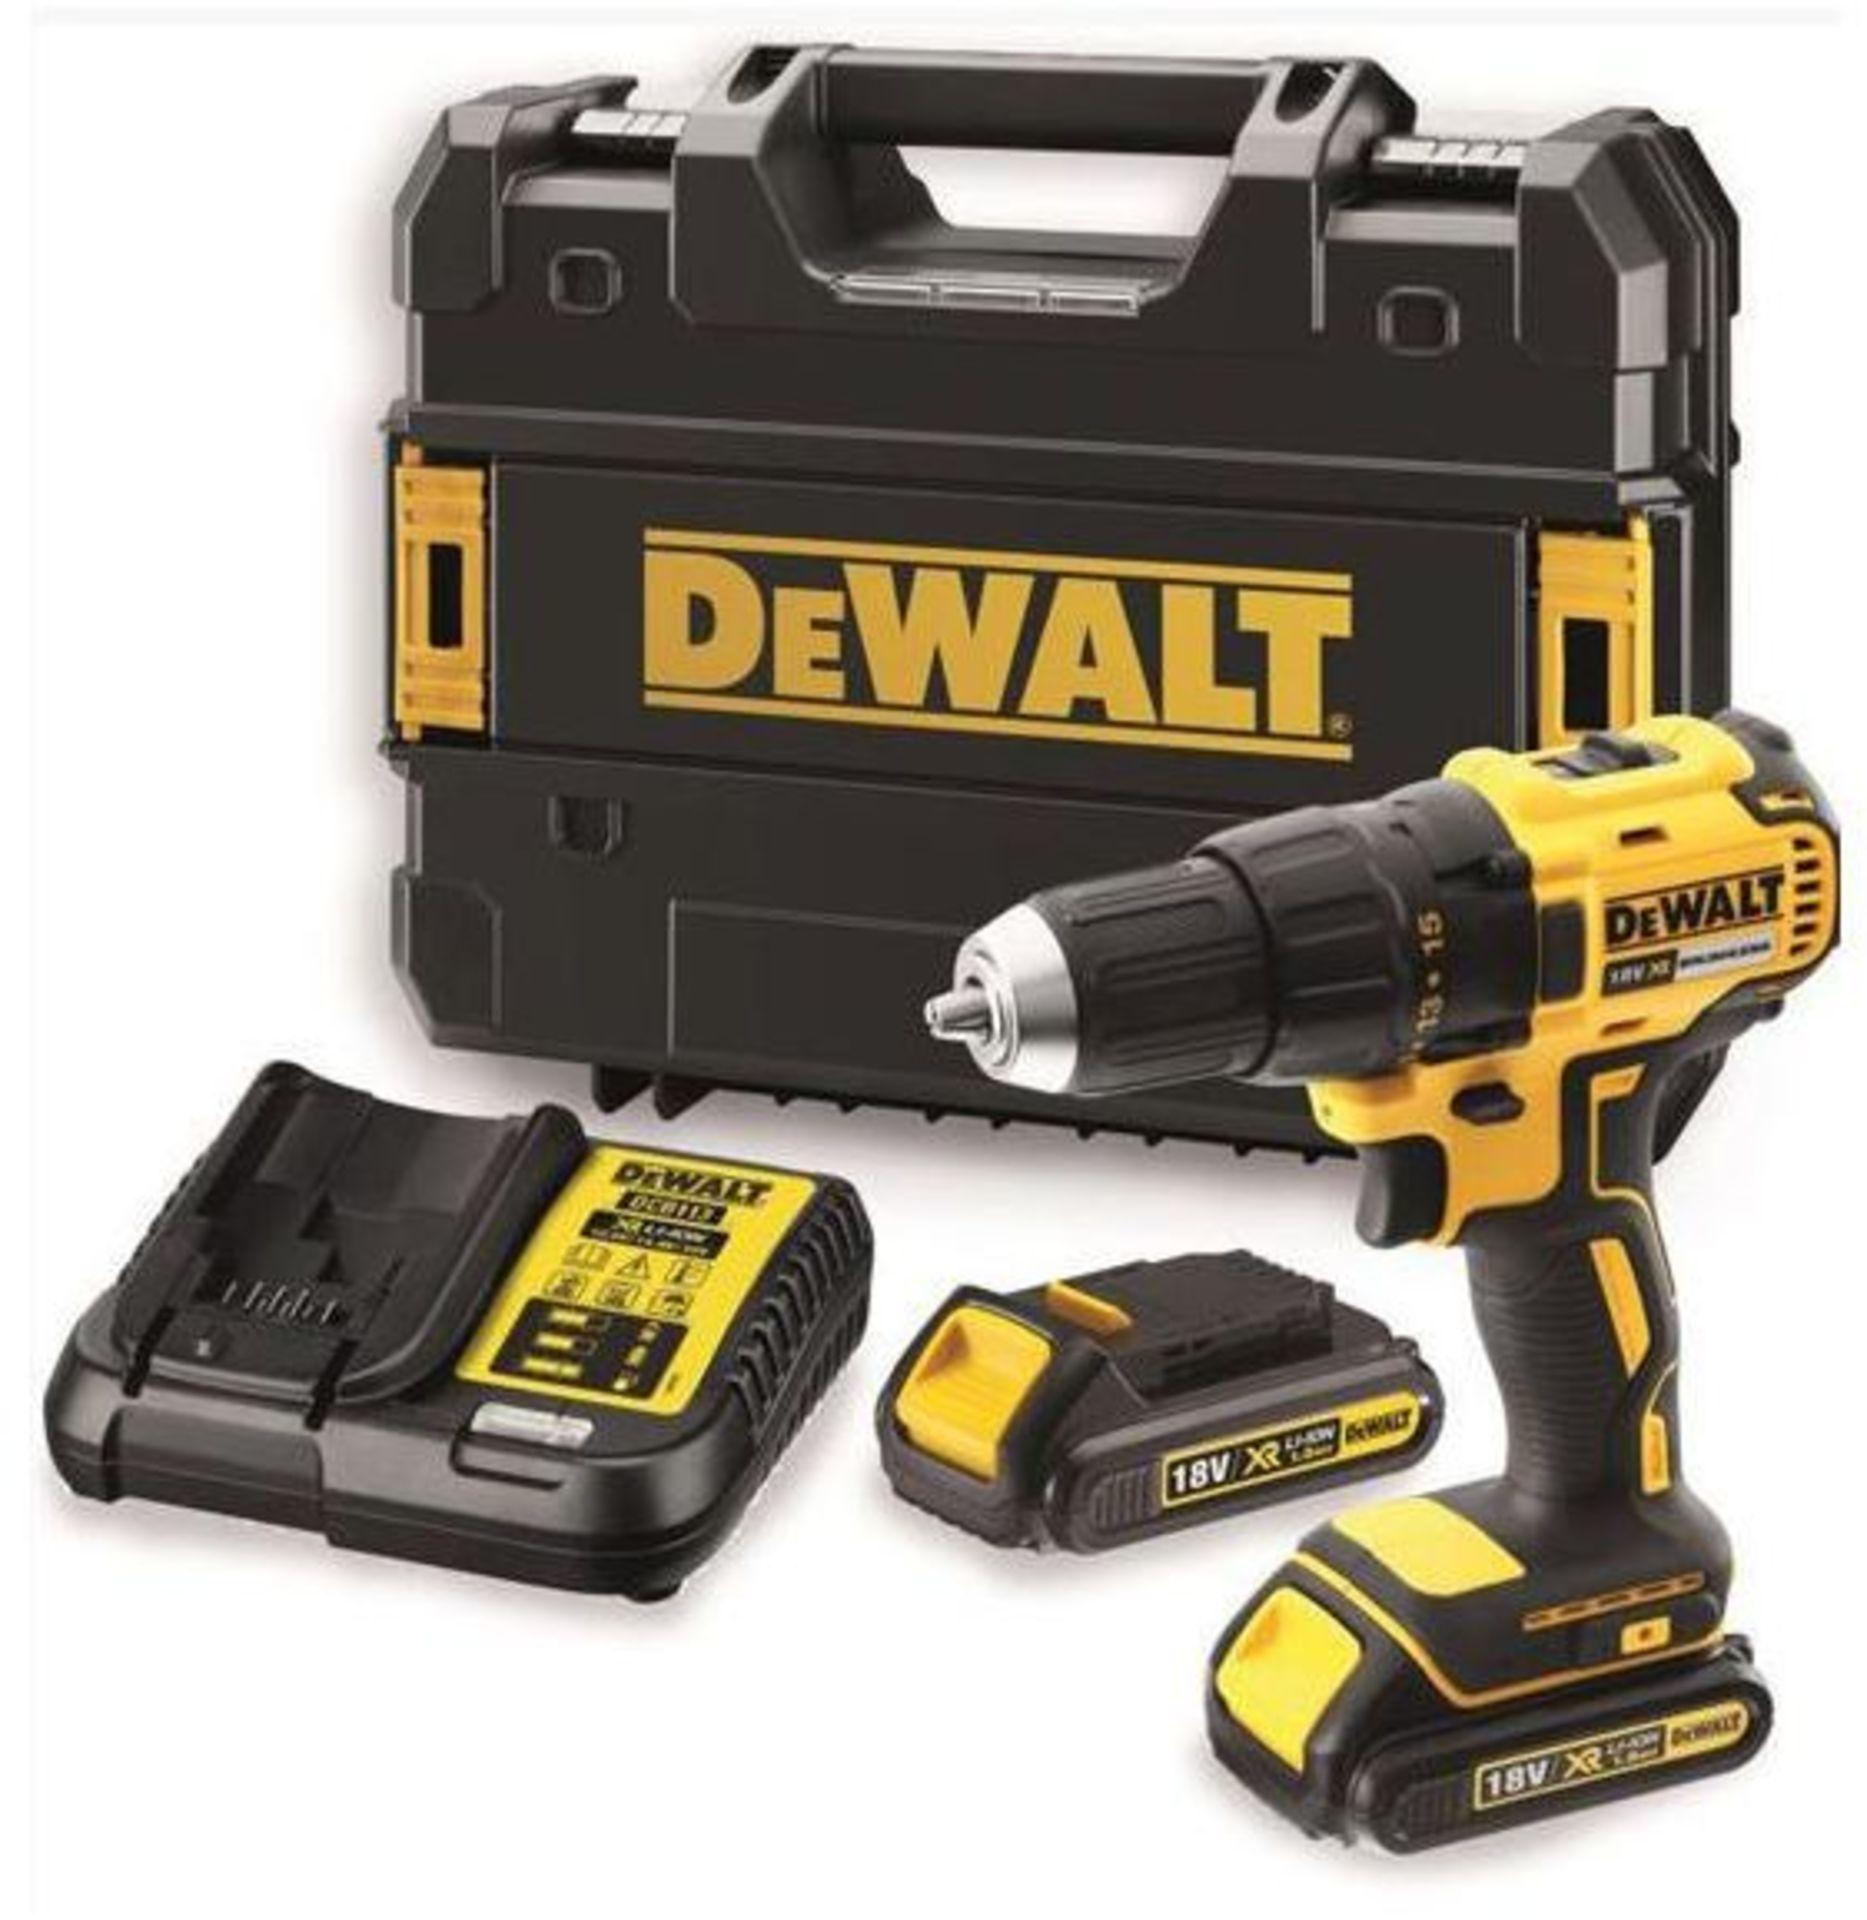 Lot 17003 - V Brand New DeWalt 18v Brushless Drill Driver + 2x Batteries + Charger + Case